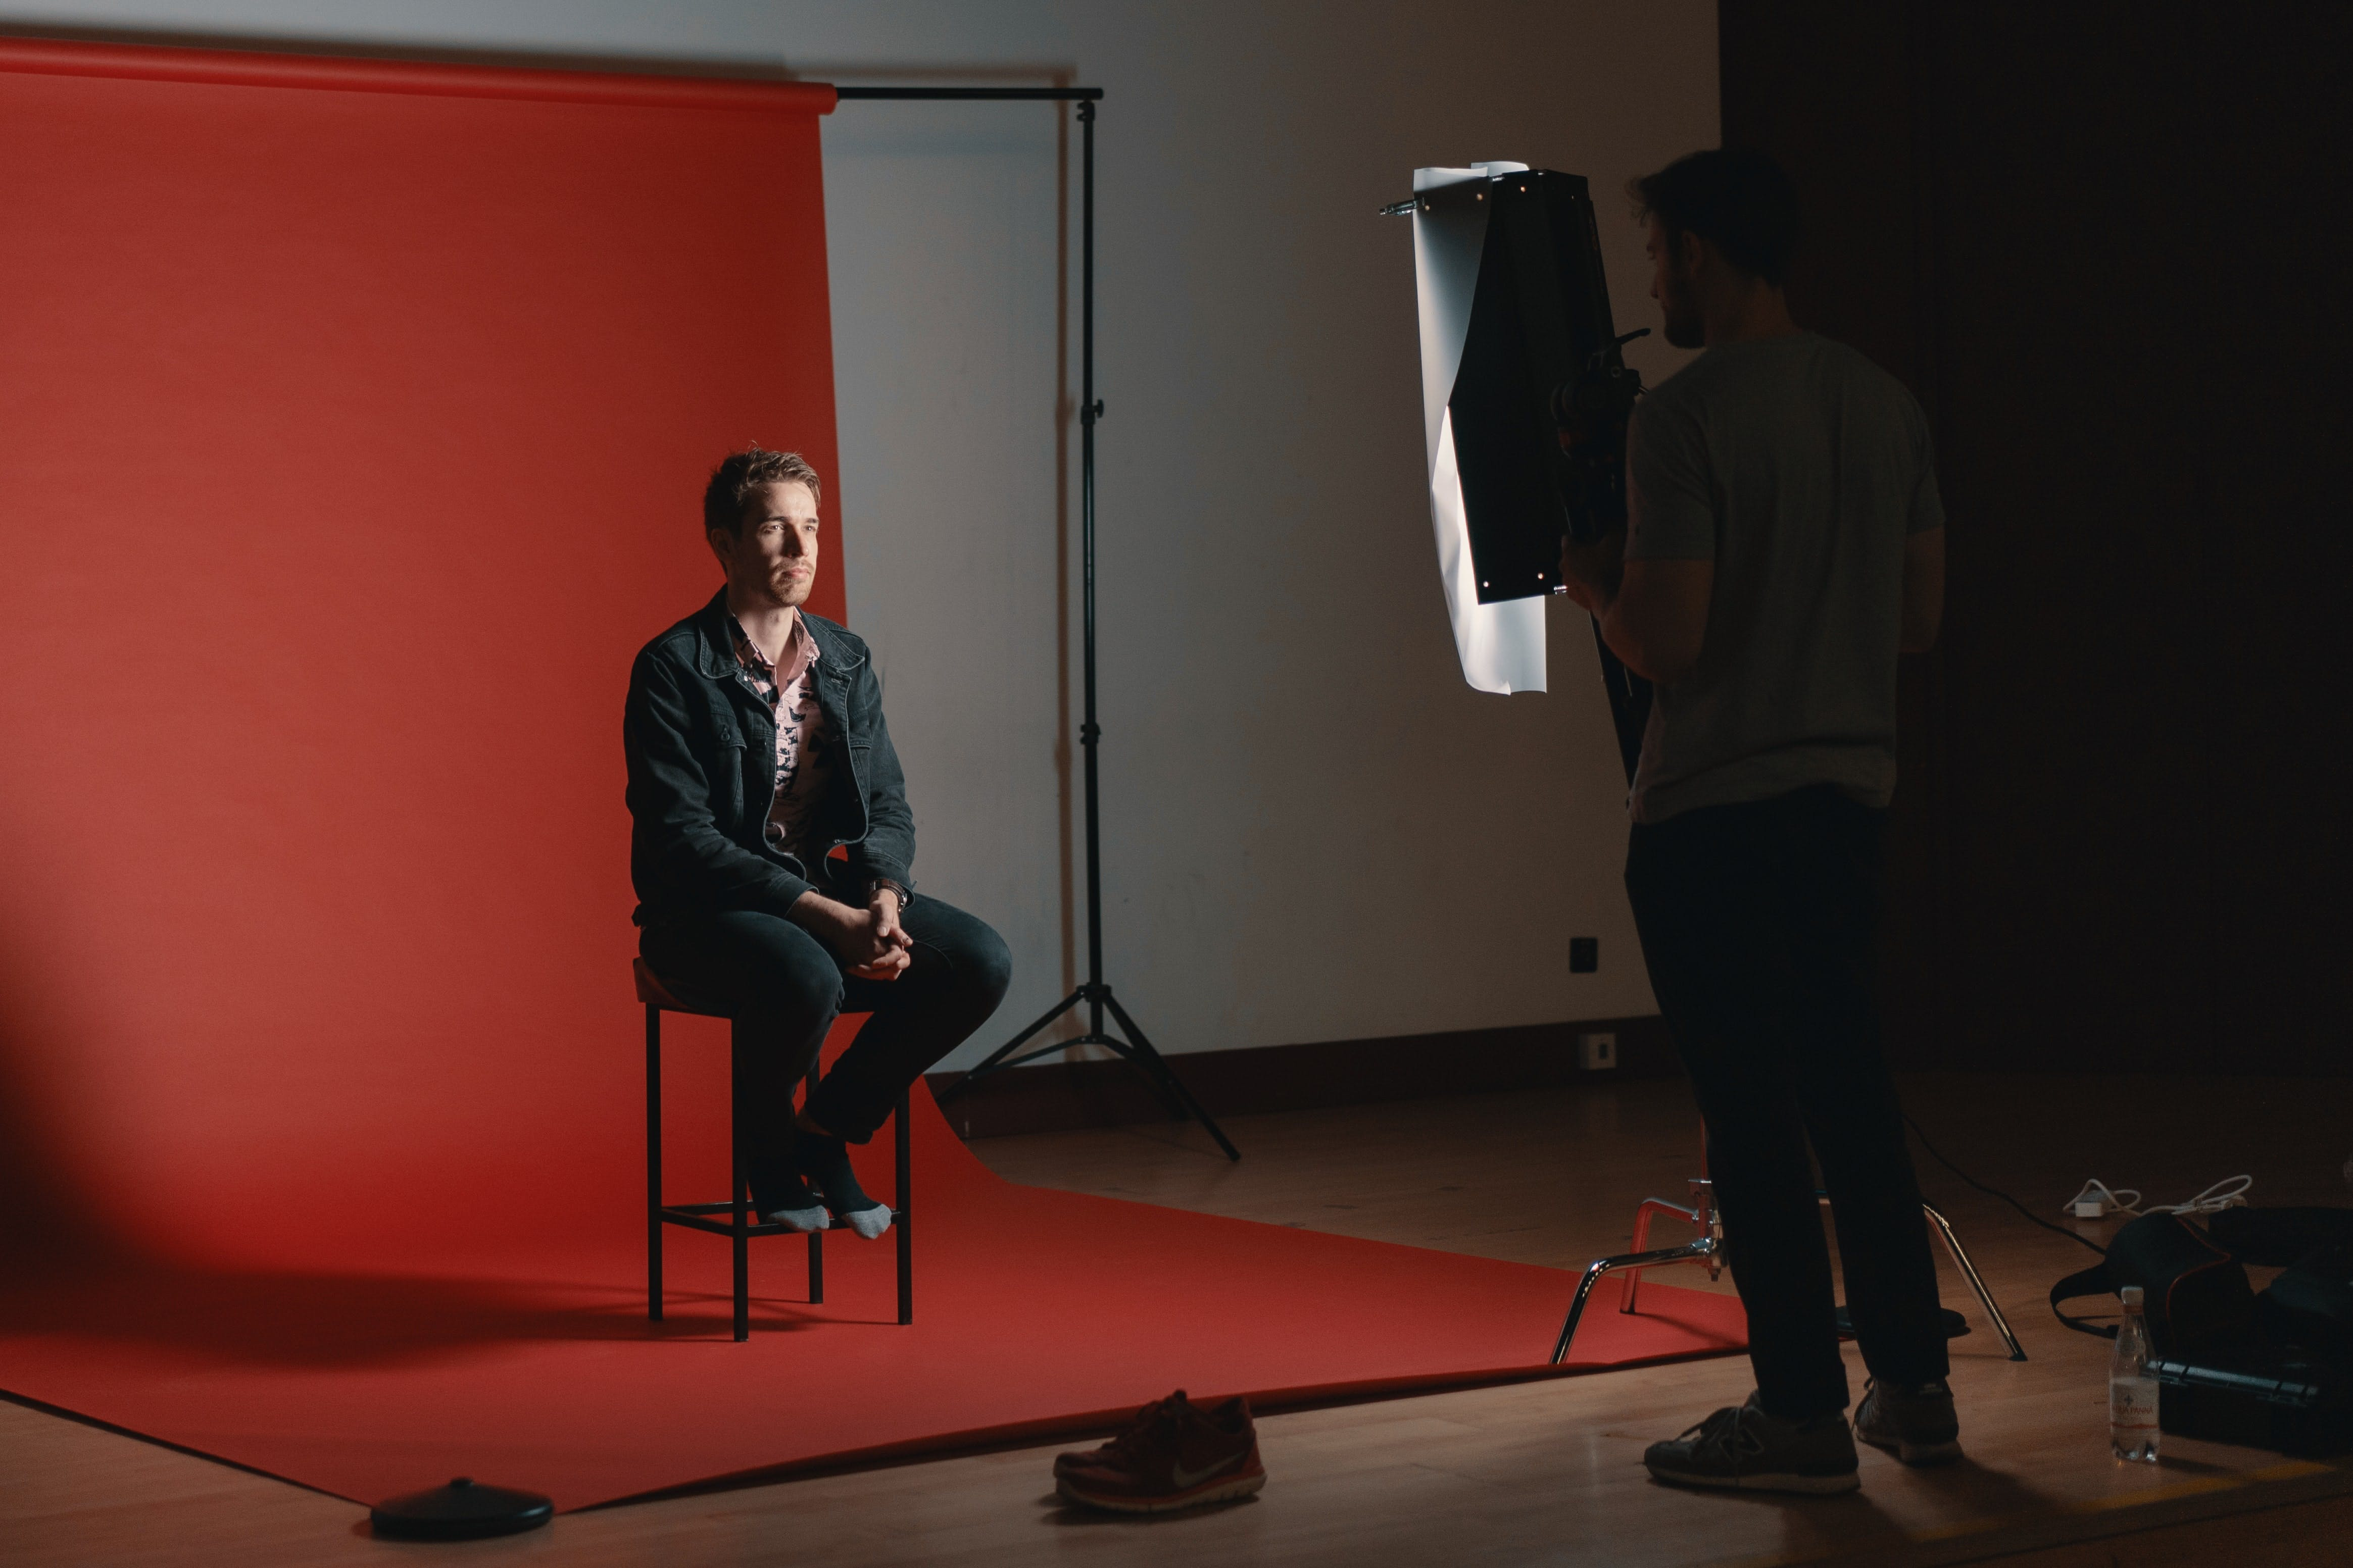 shooting photo studio, studio photo, photos studio